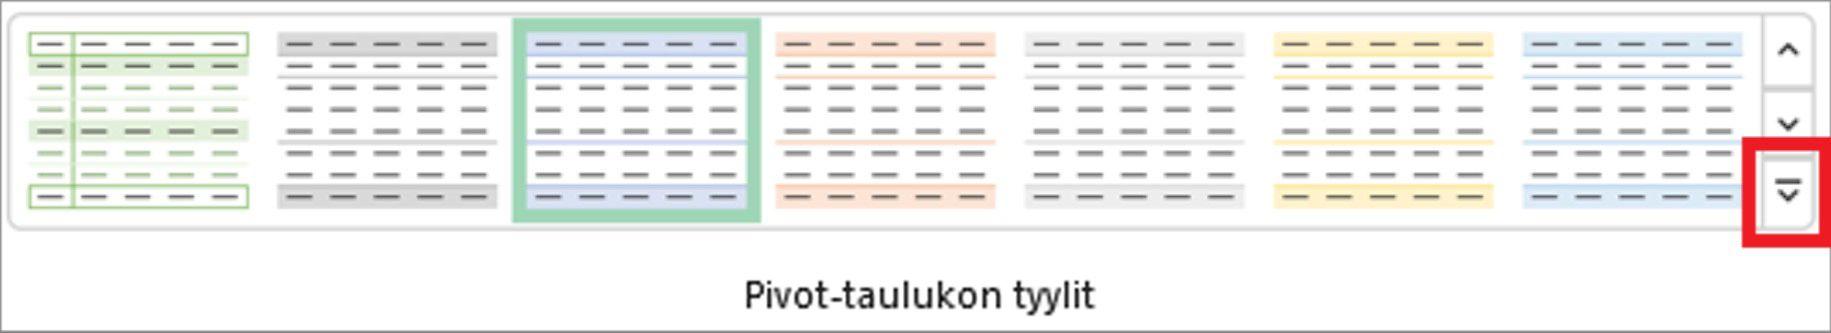 Excelin valintanauhan kuva